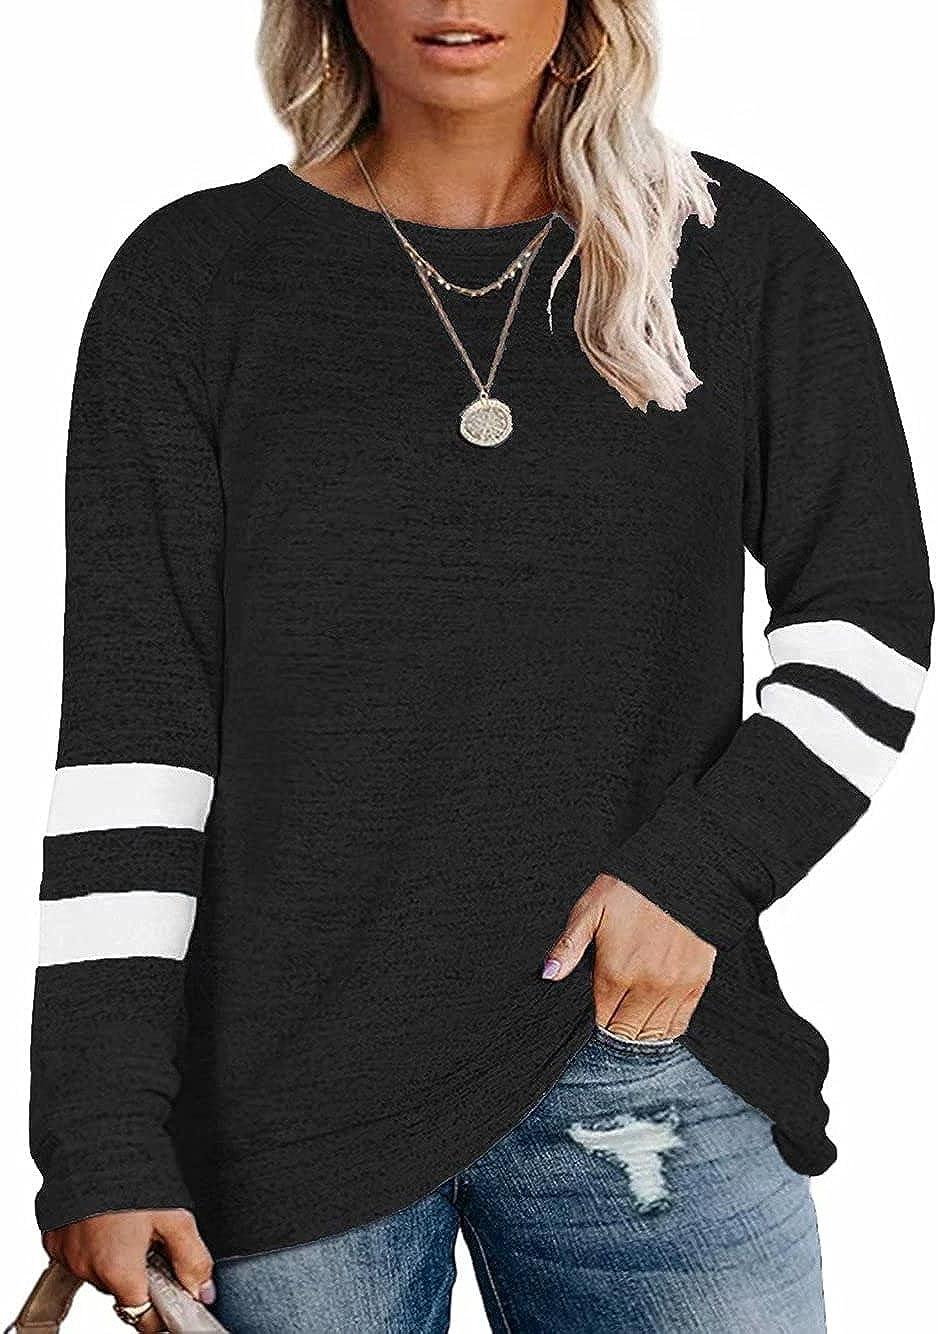 WKIOR Plus Size Tops For Women Long Sleeve Tunic Loose Shirt Crewneck Pullover Sweatshirts